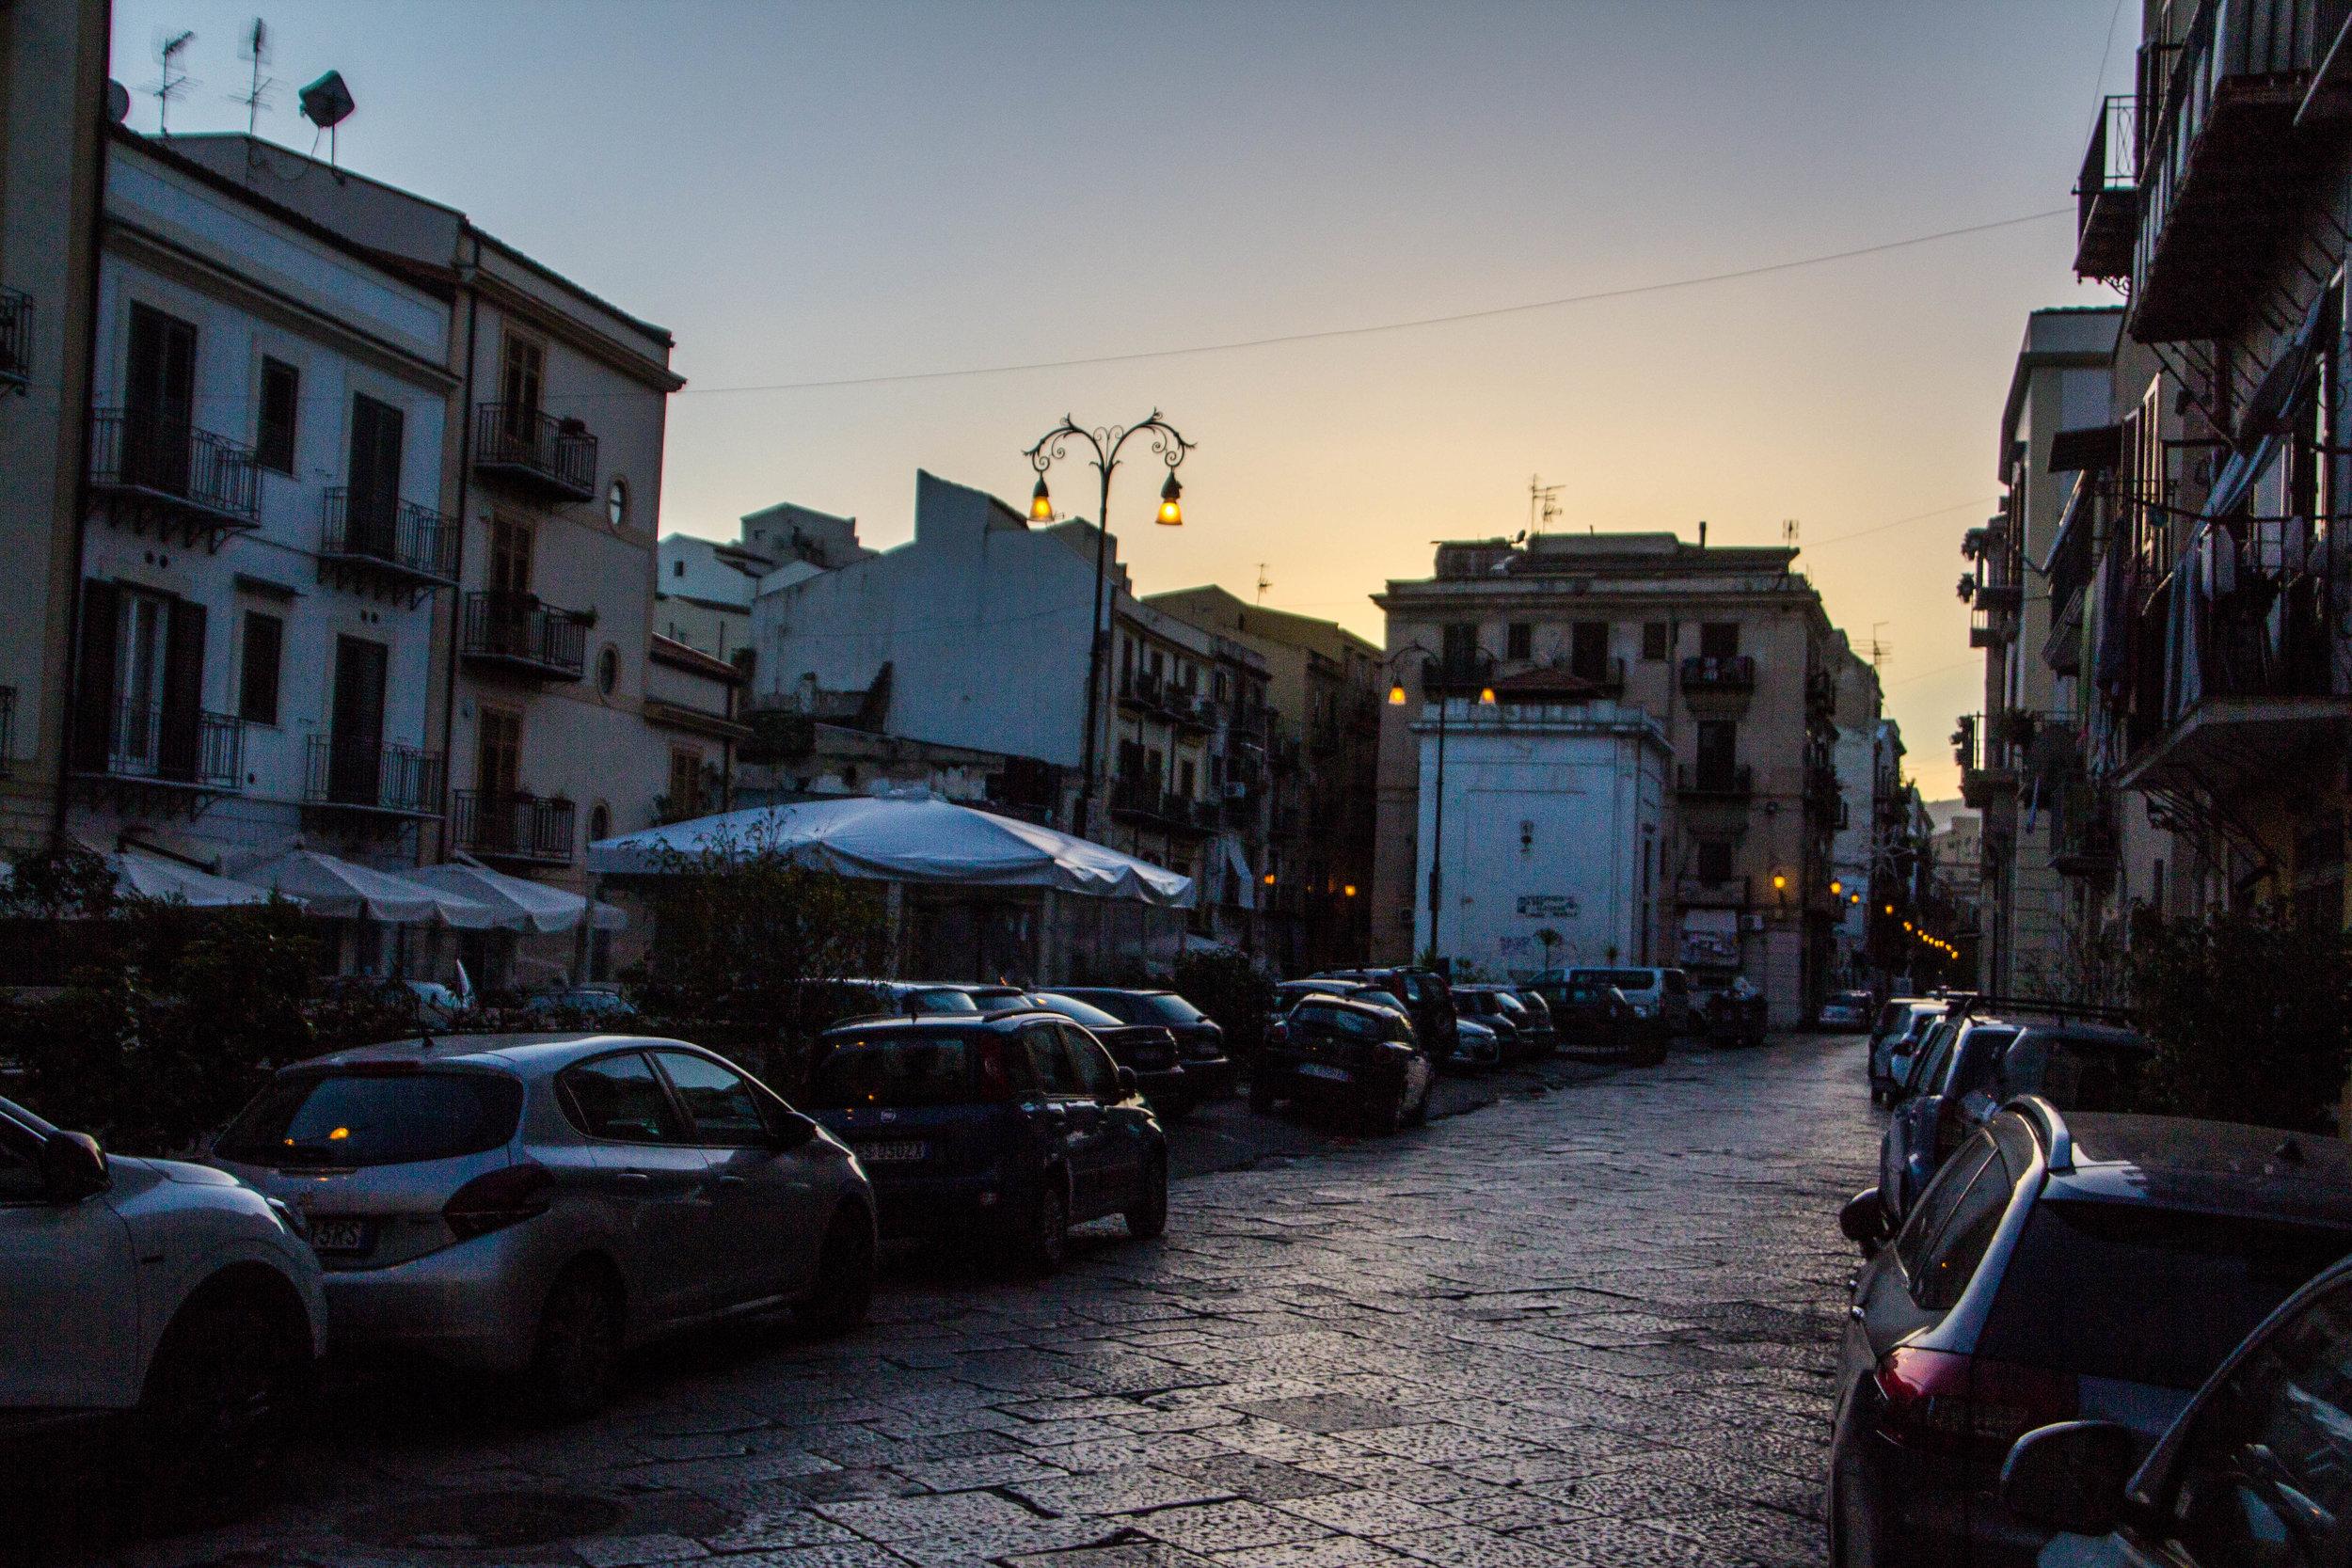 streets-palermo-sicily-27.jpg